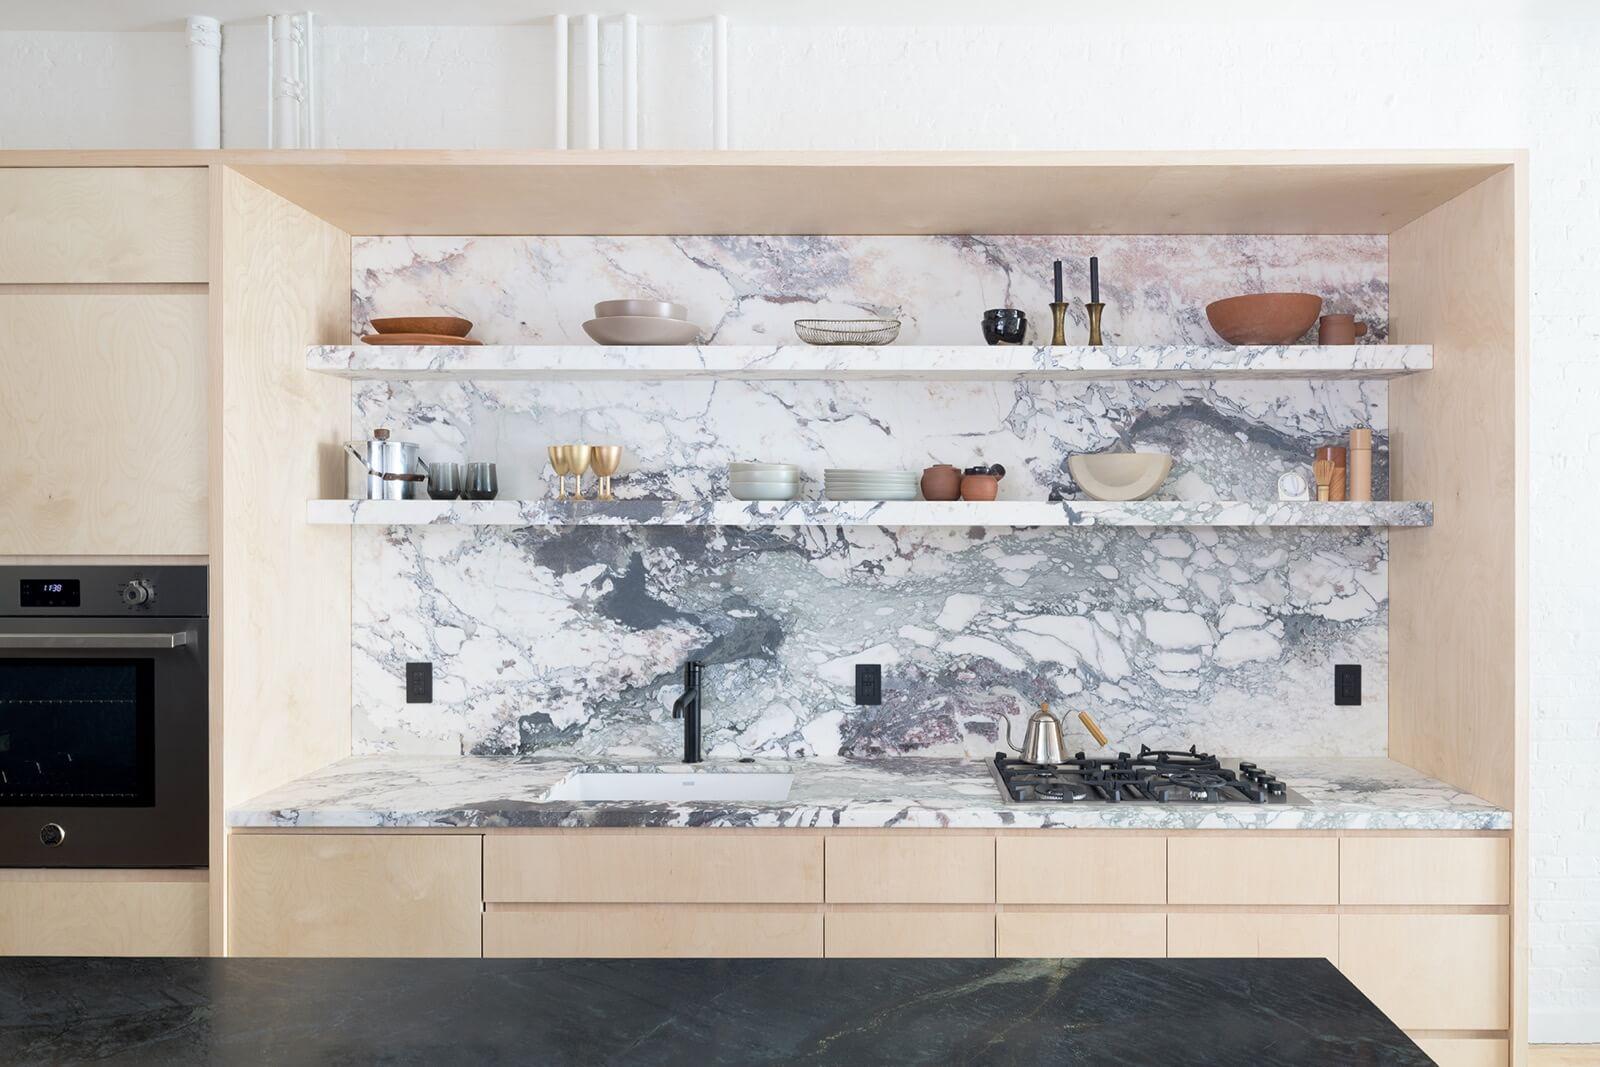 interiors-renovation/interior-design-ideas-brooklyn-dean-works-clinton-hill